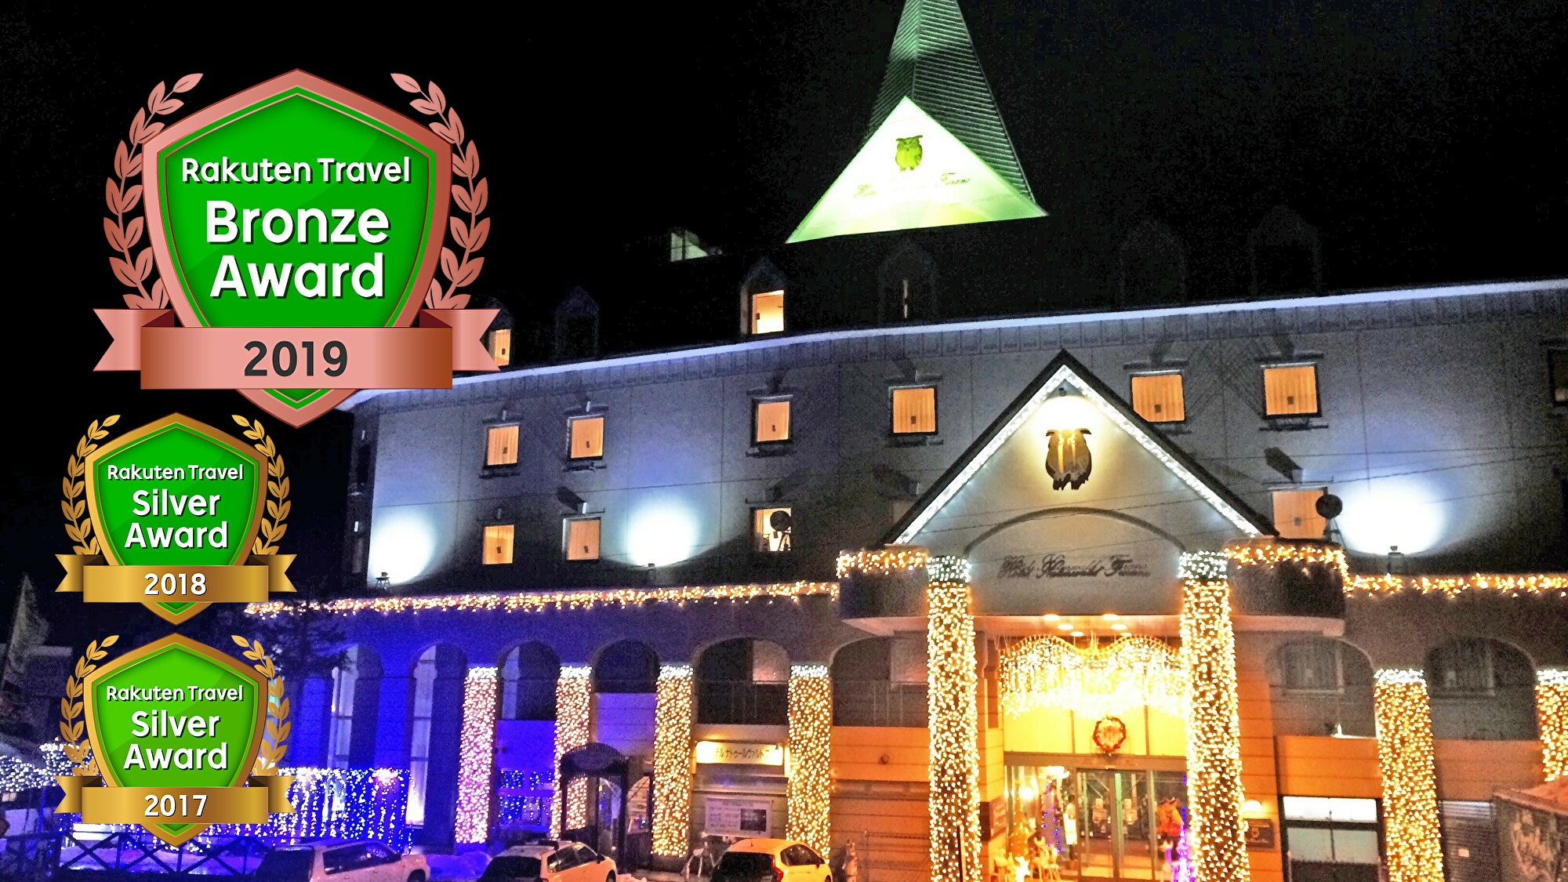 4db49f8ece51 ホテル ナトゥールヴァルト富良野奇跡の景色を持つ富良野、その景色を一望できる小高い丘の上に建つプチリゾートホテルです。